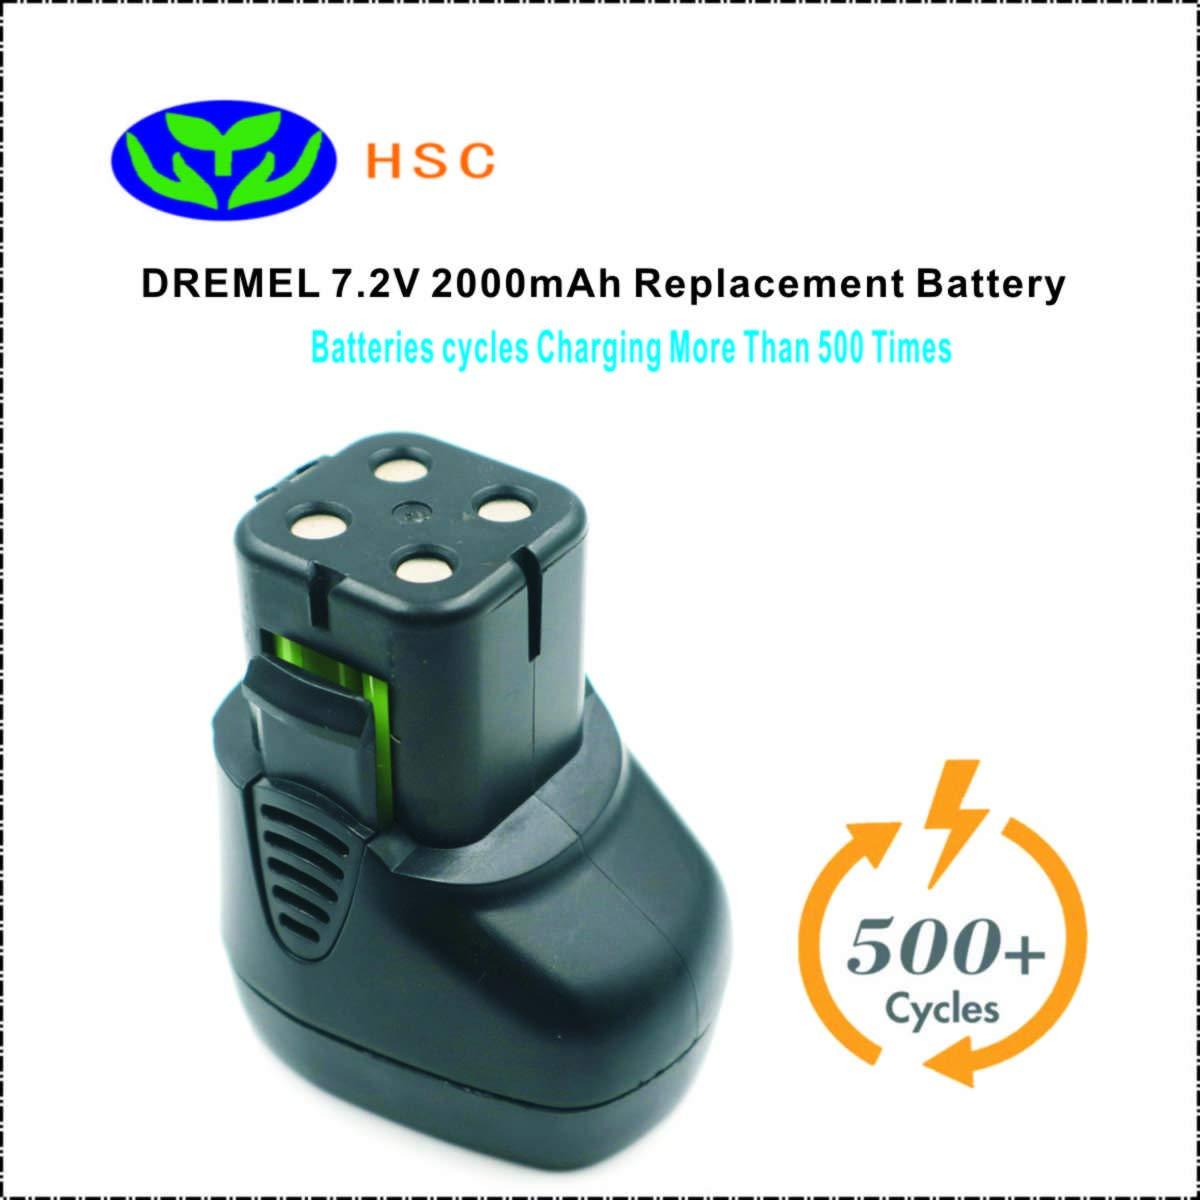 DRE7.2A 2000mAh 7.2V NiMh Battery Replacement DREMEL 757-01,758-01 Original Battery